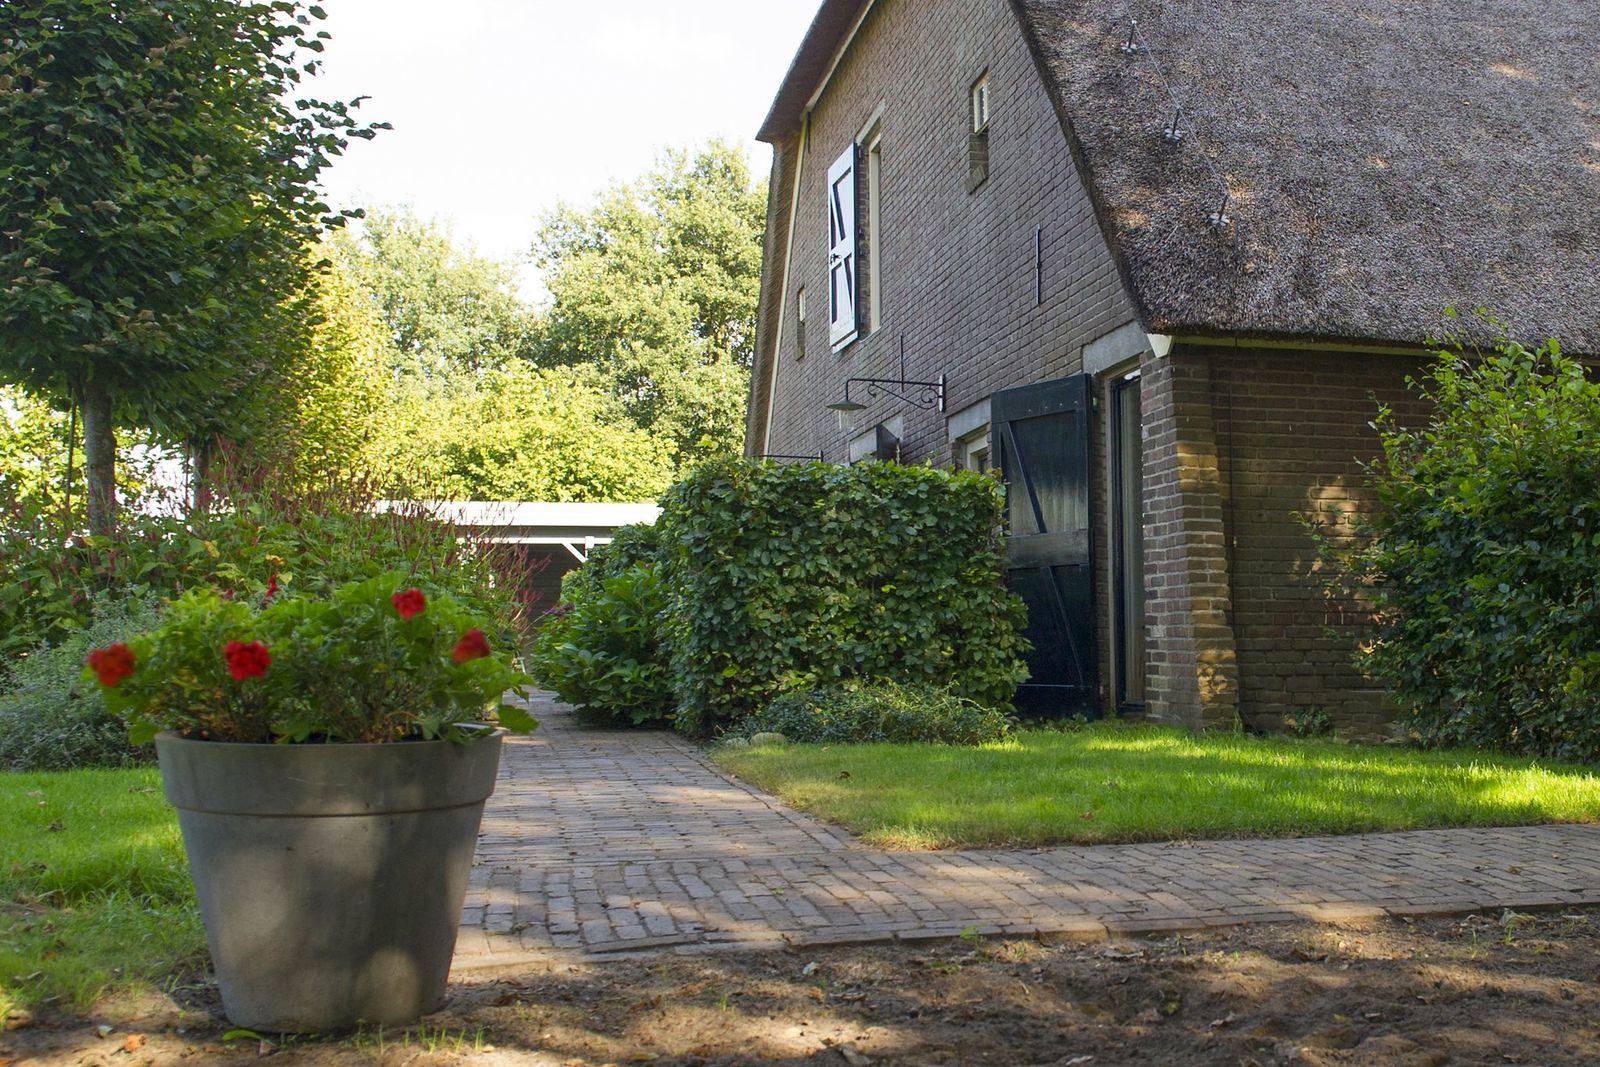 Eemster 33, Dwingeloo